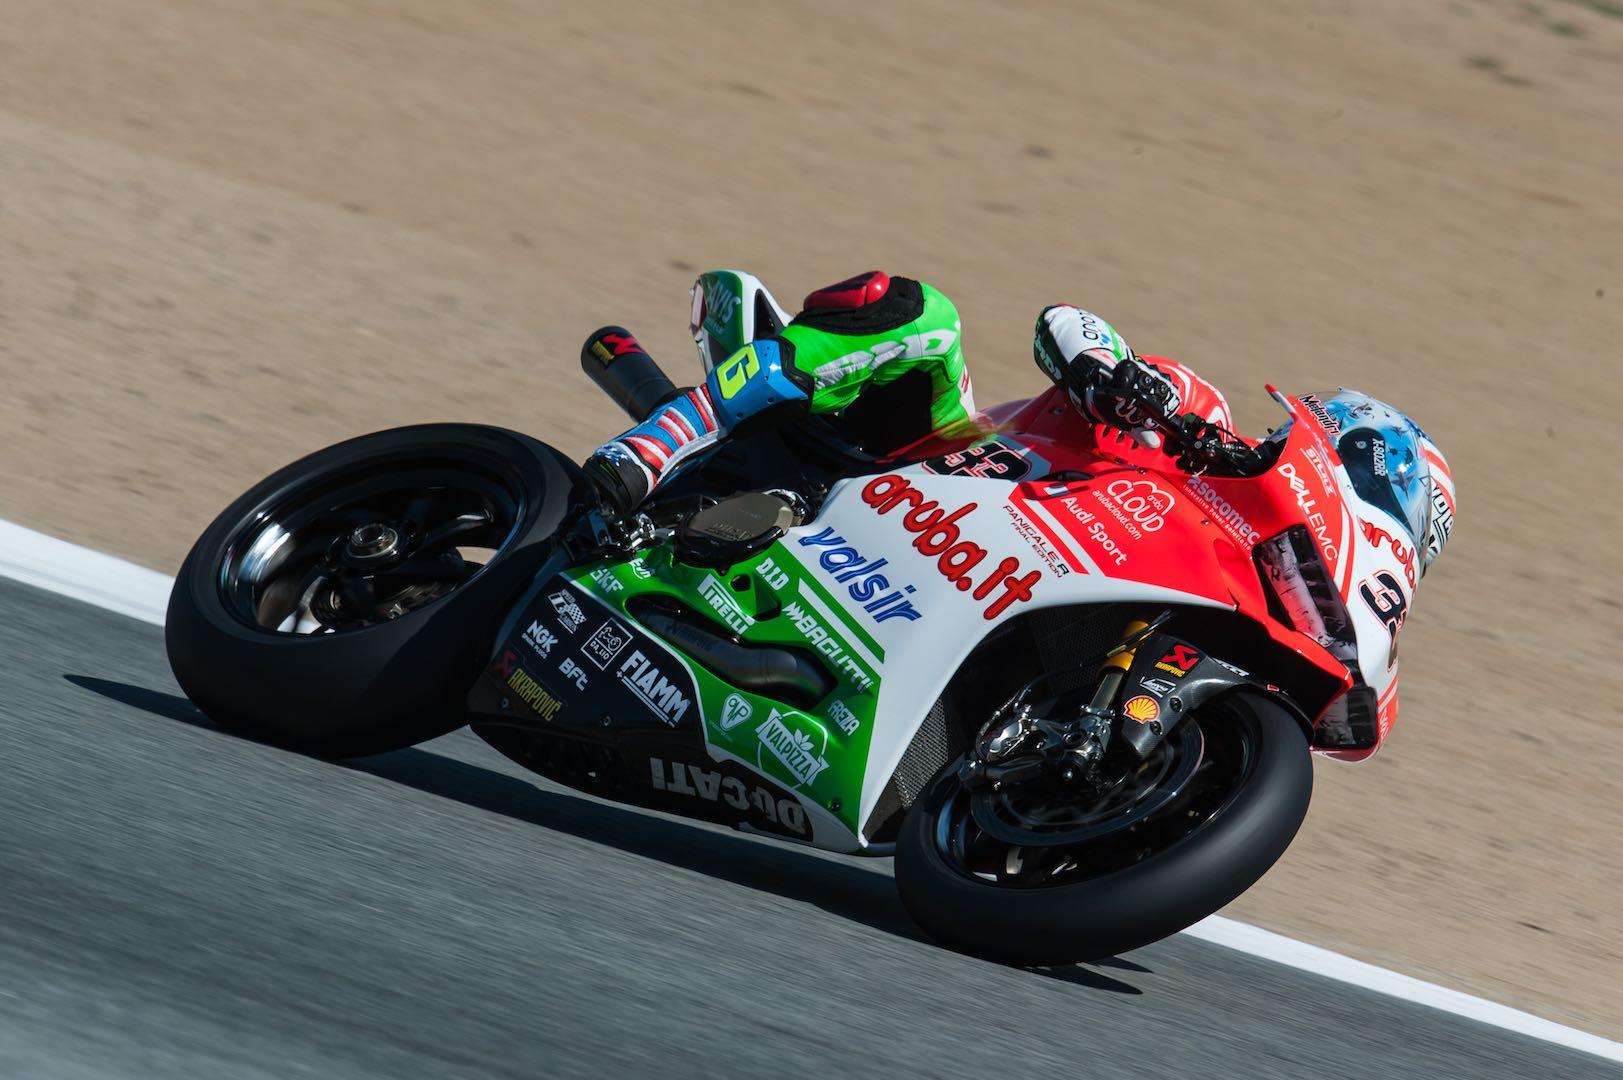 Marco Melandri Extends Ducati Contract for 2018 WorldSBK